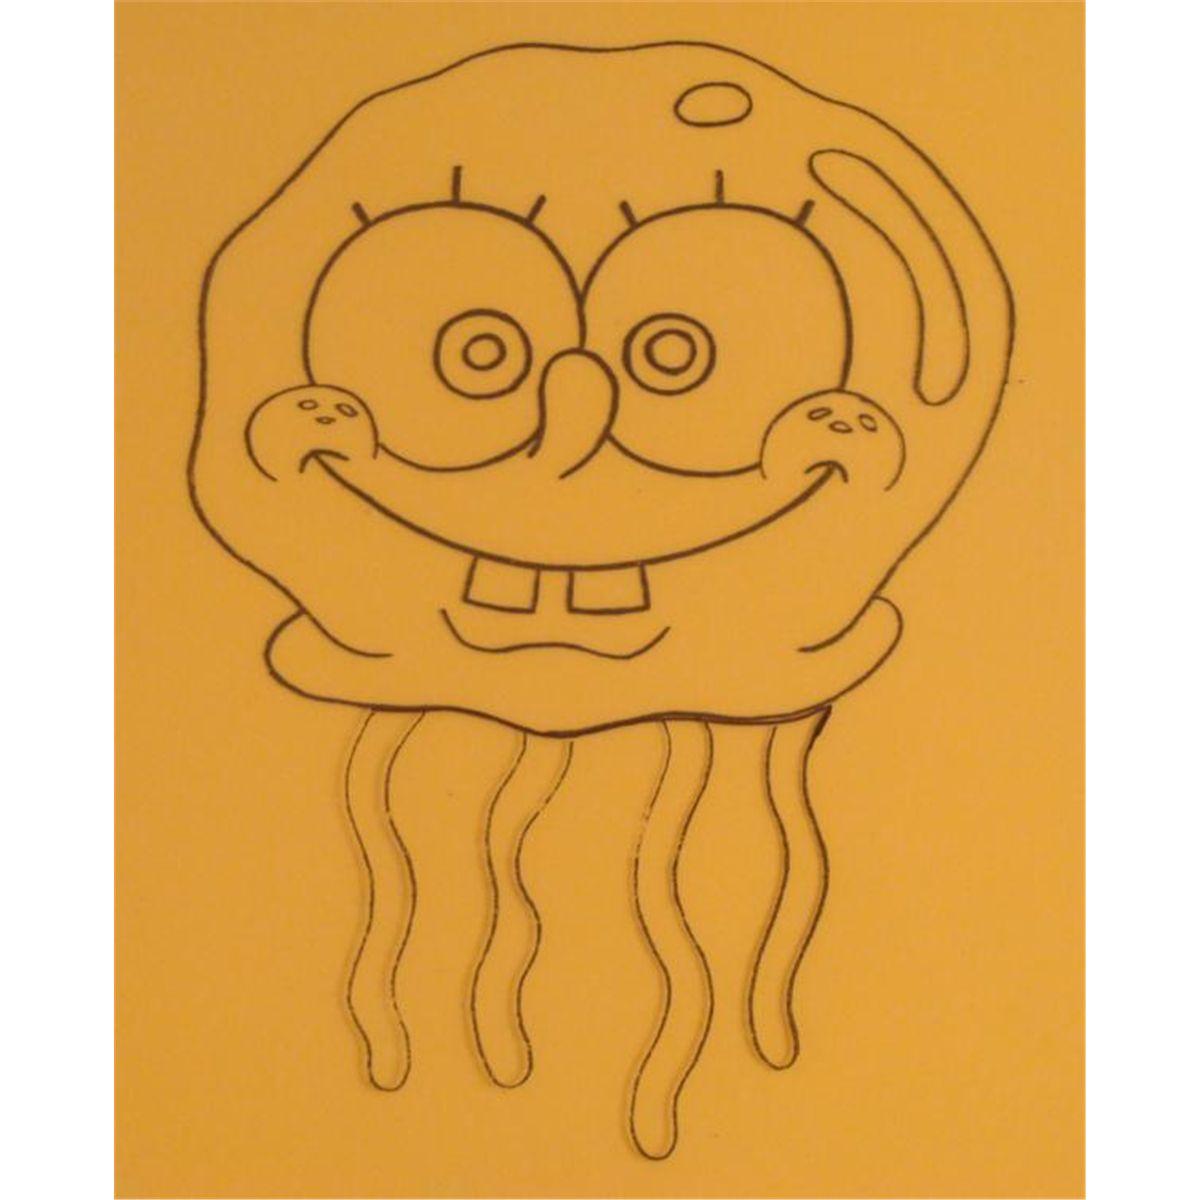 Drawn jellyfish spongebob SpongeBob Art Jellyfish Original Orange